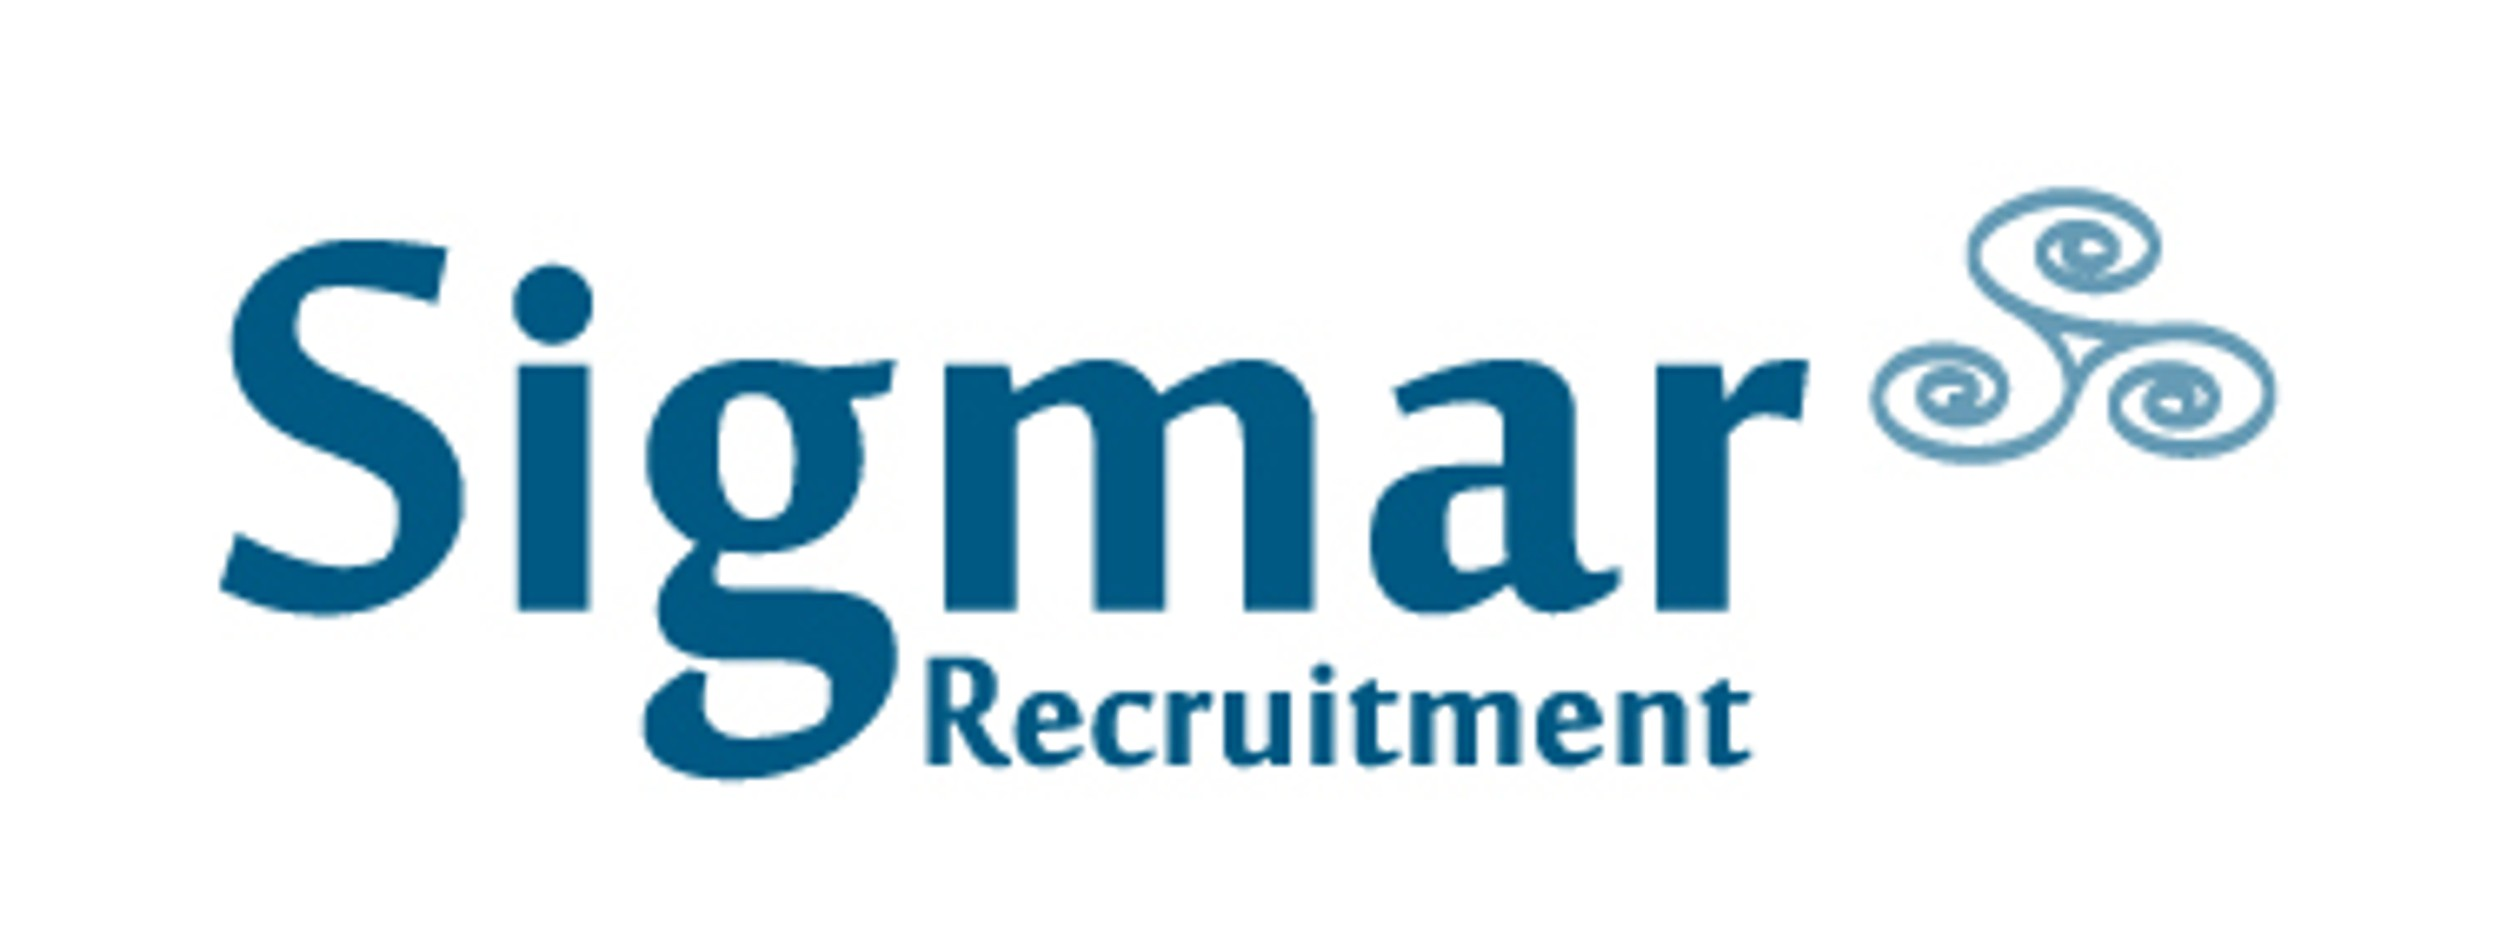 Sigmar Recruitment logo